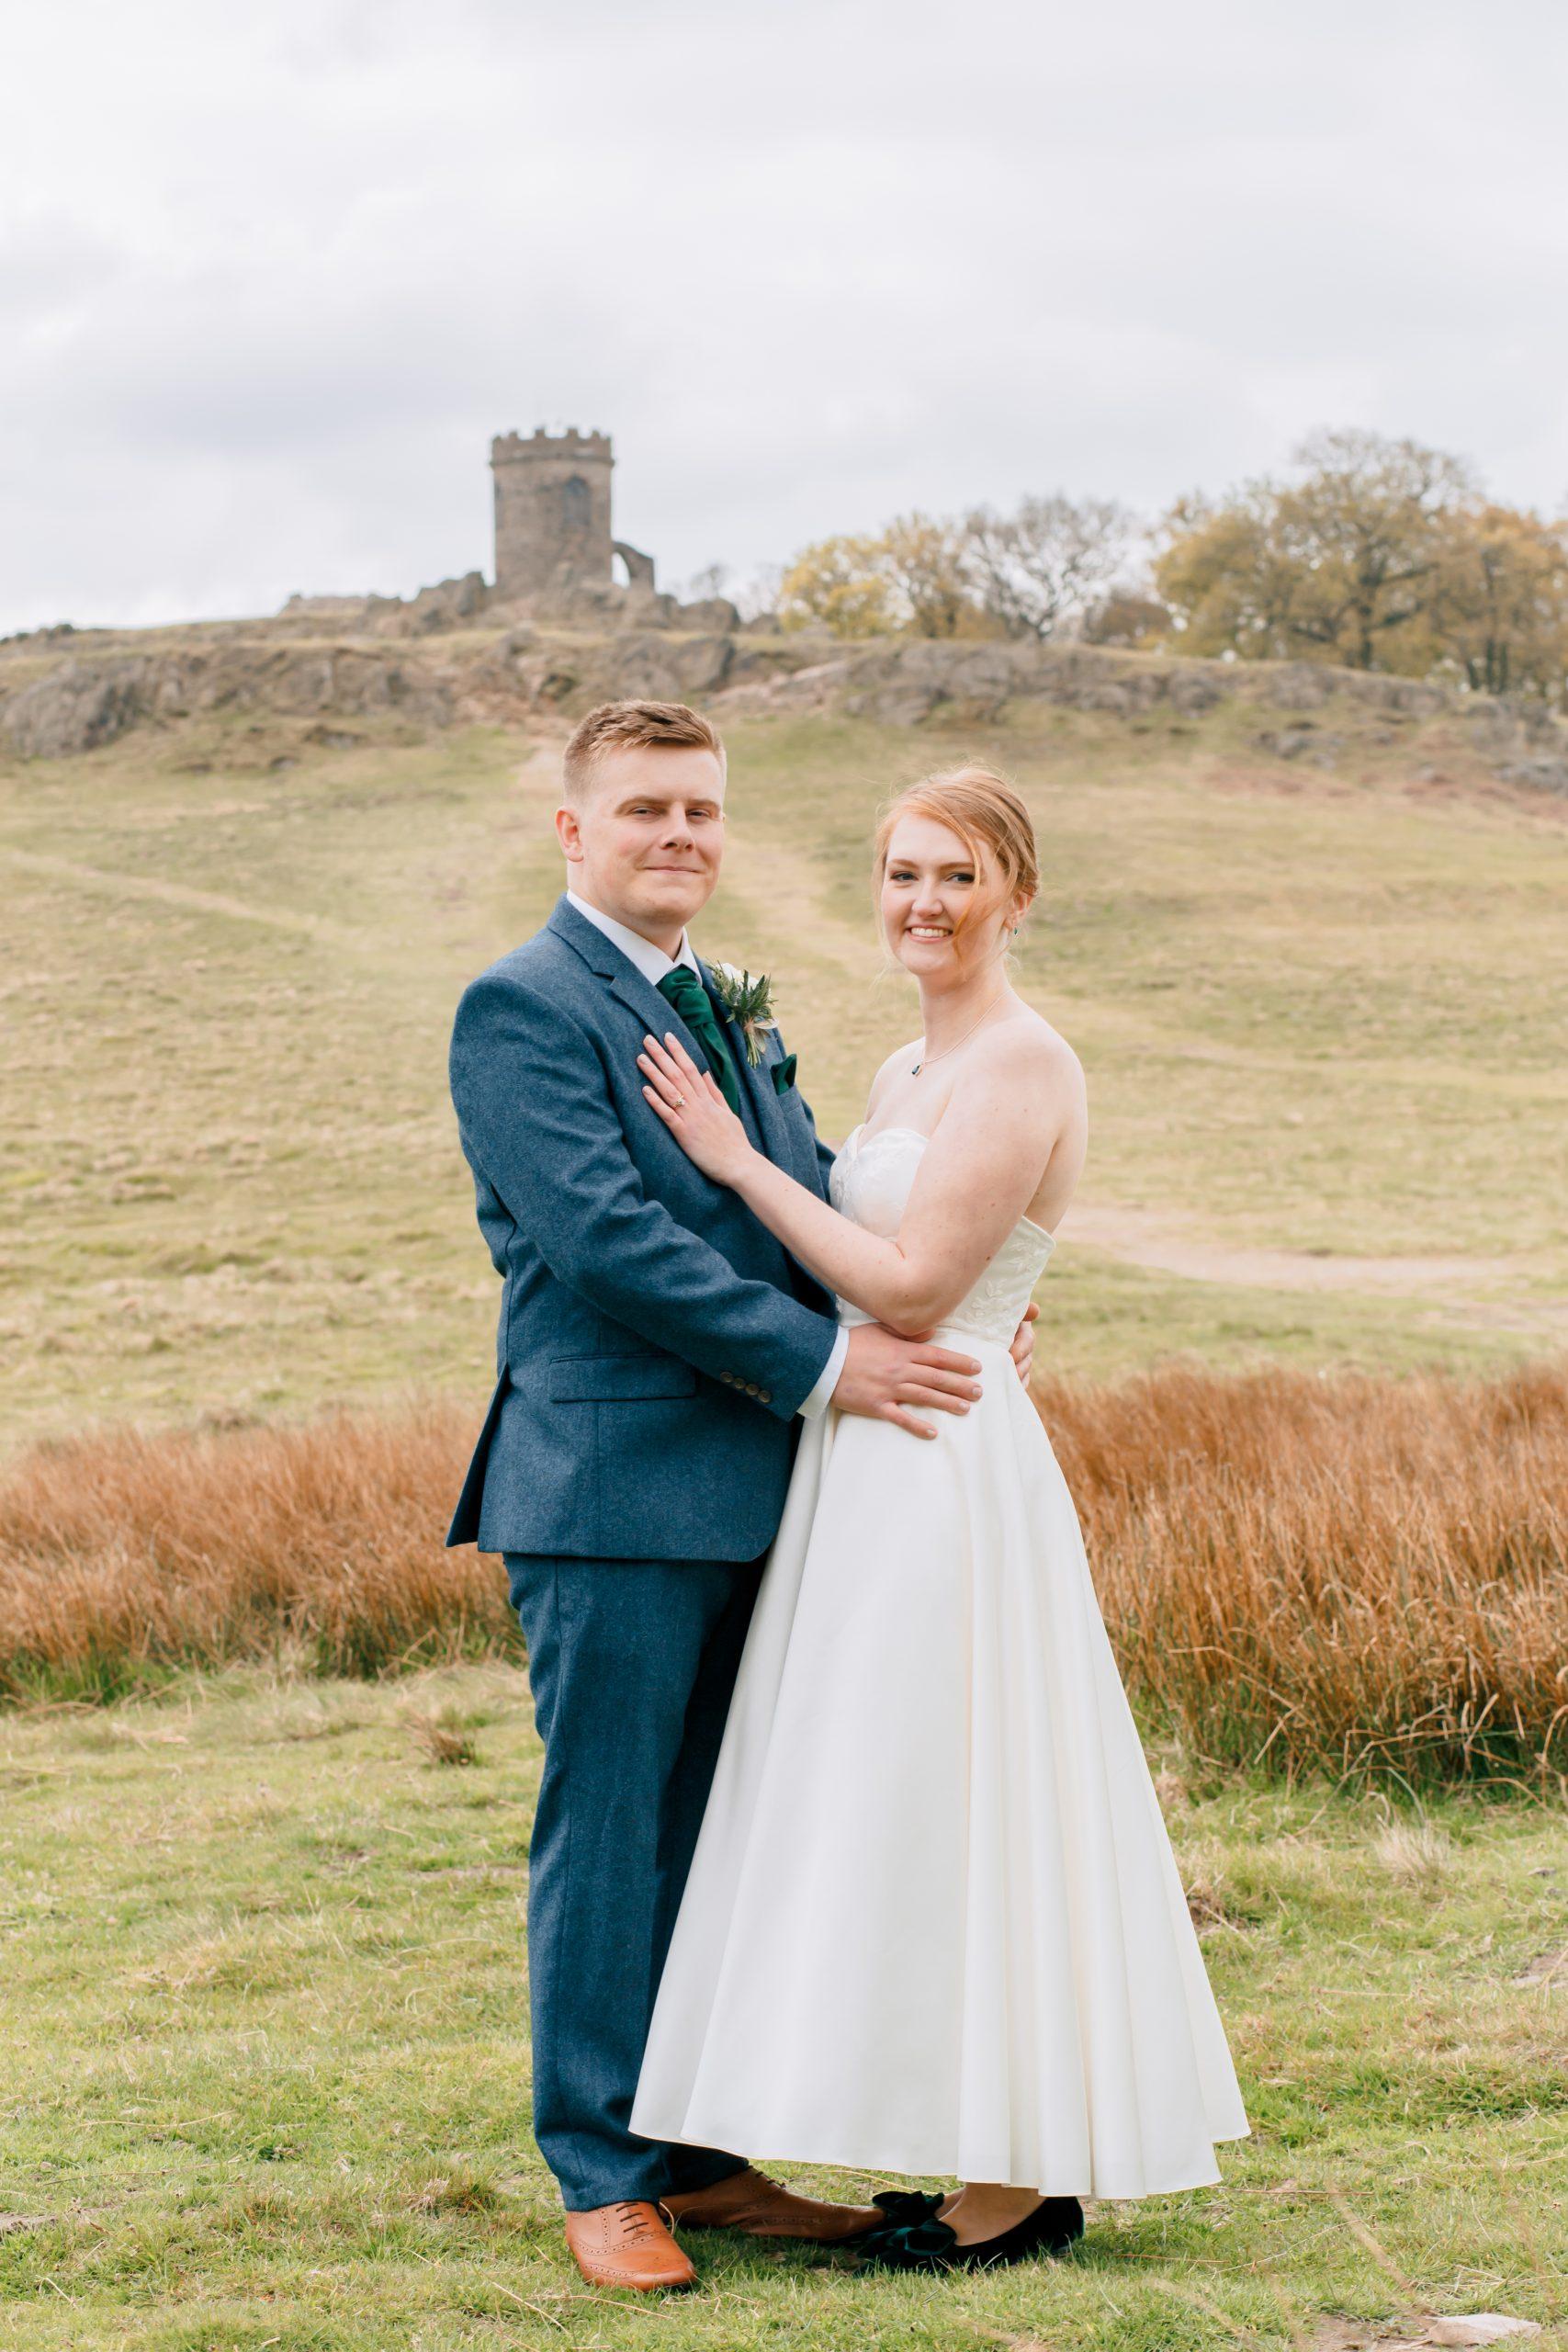 Bradgate Park Weddings - Emma Lowe Wedding Photography